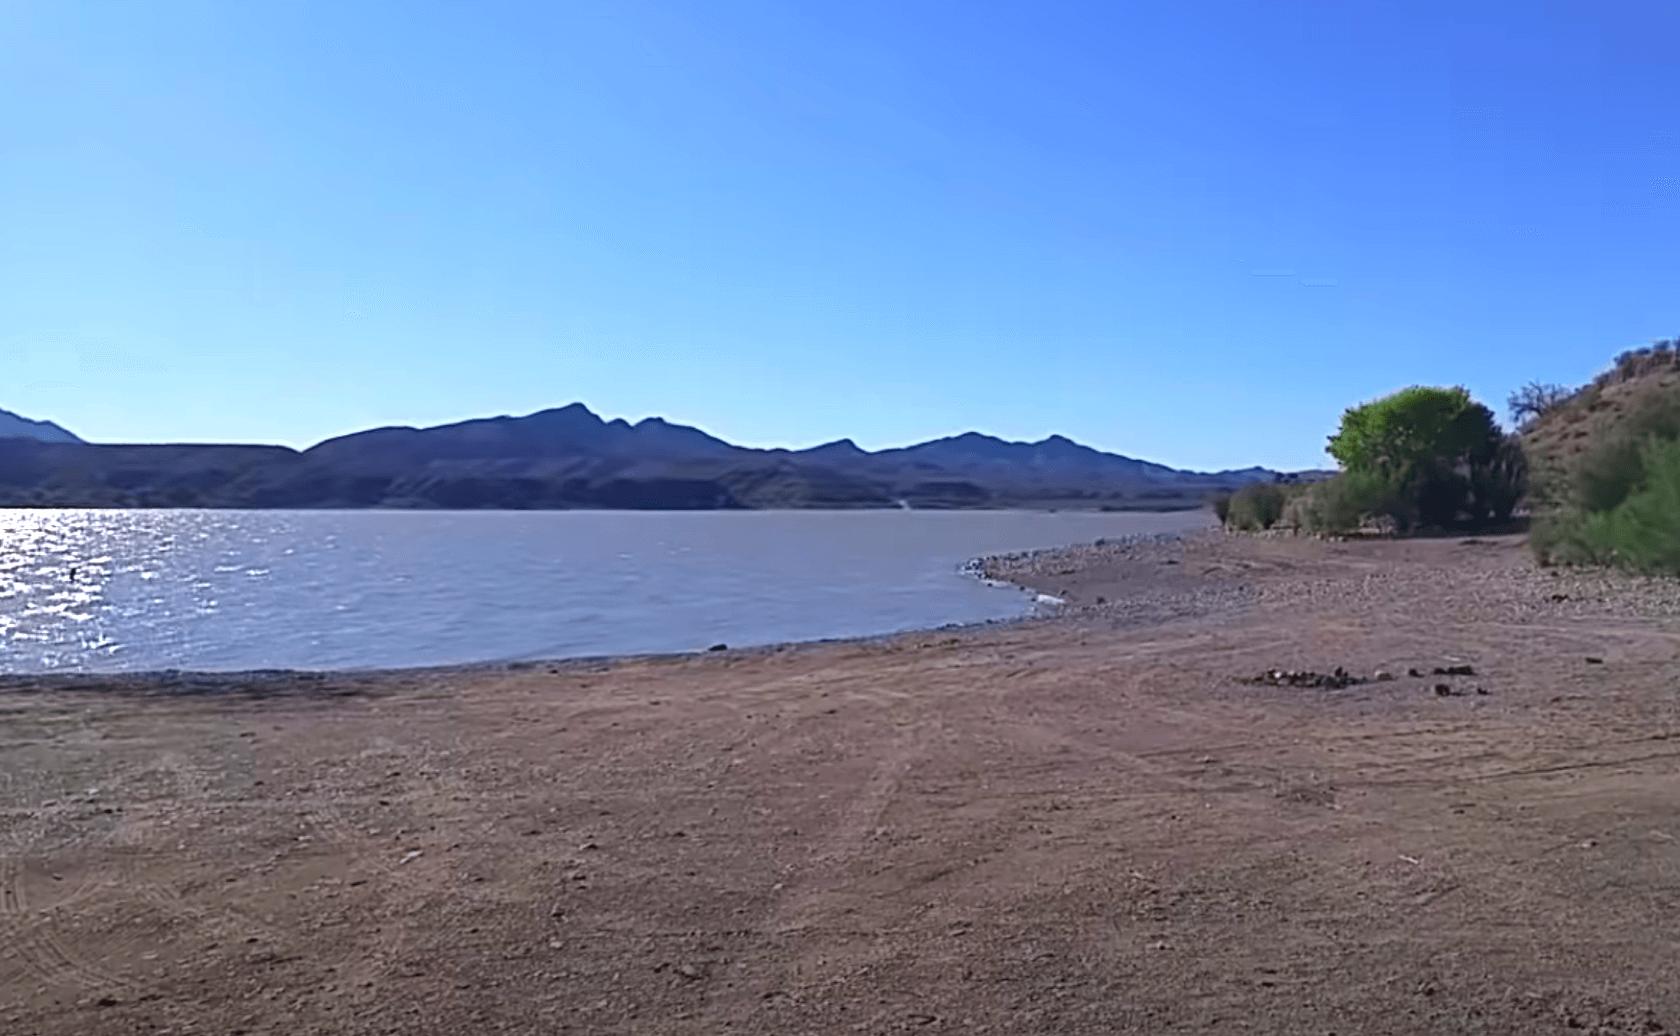 Caballo-Lake-Fishing-Guide-02-1